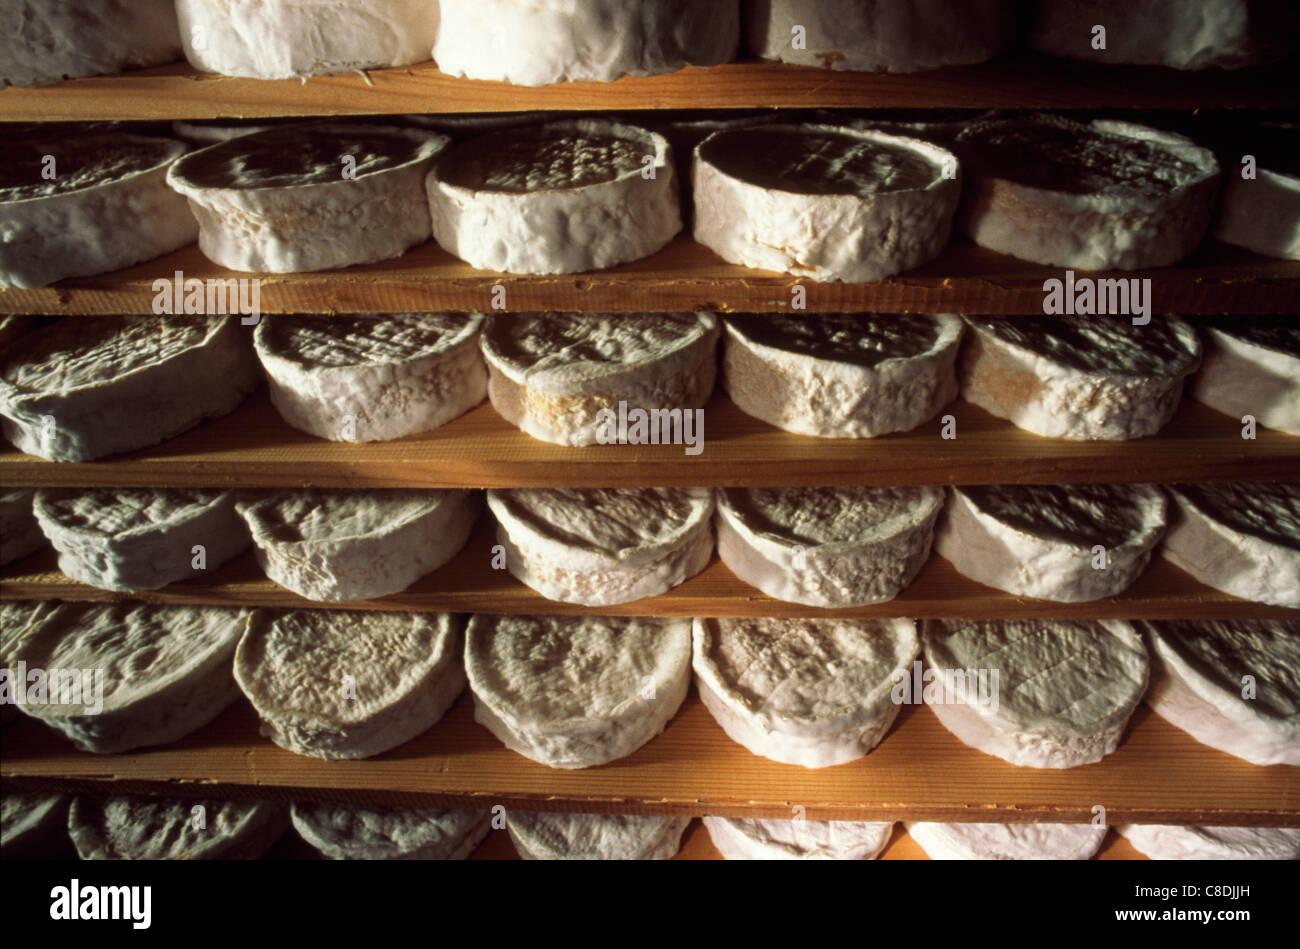 Maturing Camemberts - Stock Image